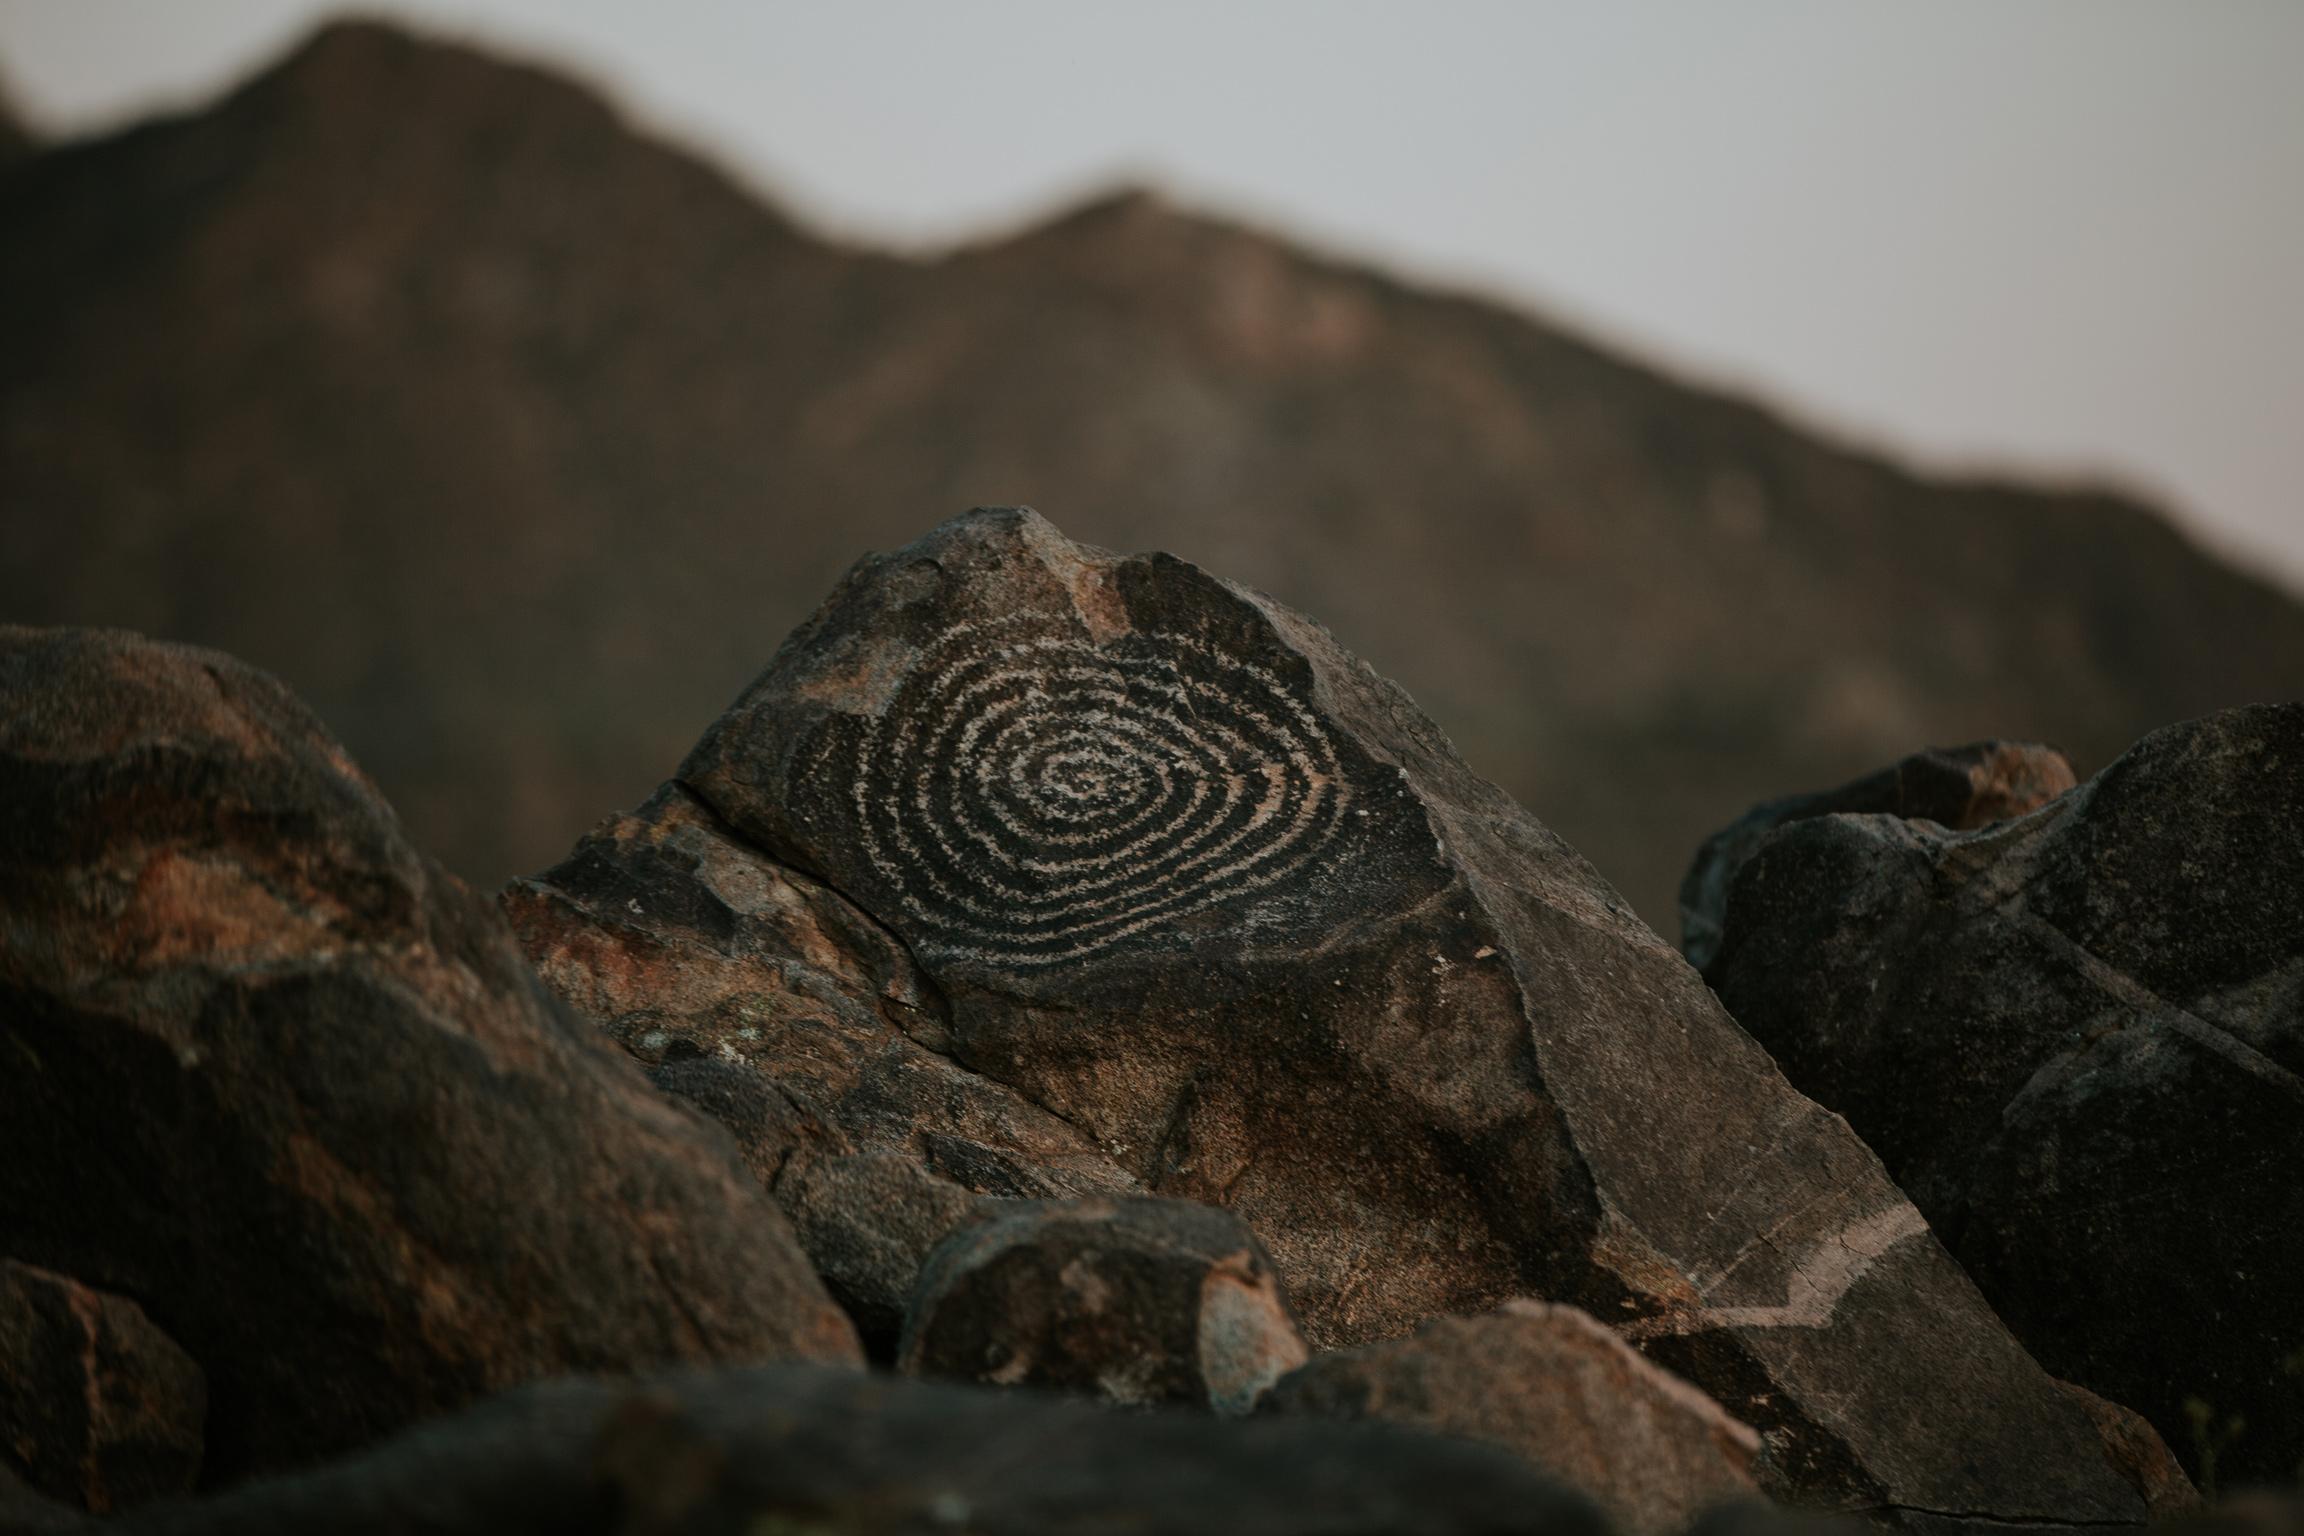 CindyGiovagnoli_Tucson_Arizona_Saguaro_National_Park_cactus_sunset_blooming_spring_sunset_petroglyphs_Native_American_indigenous-021.jpg